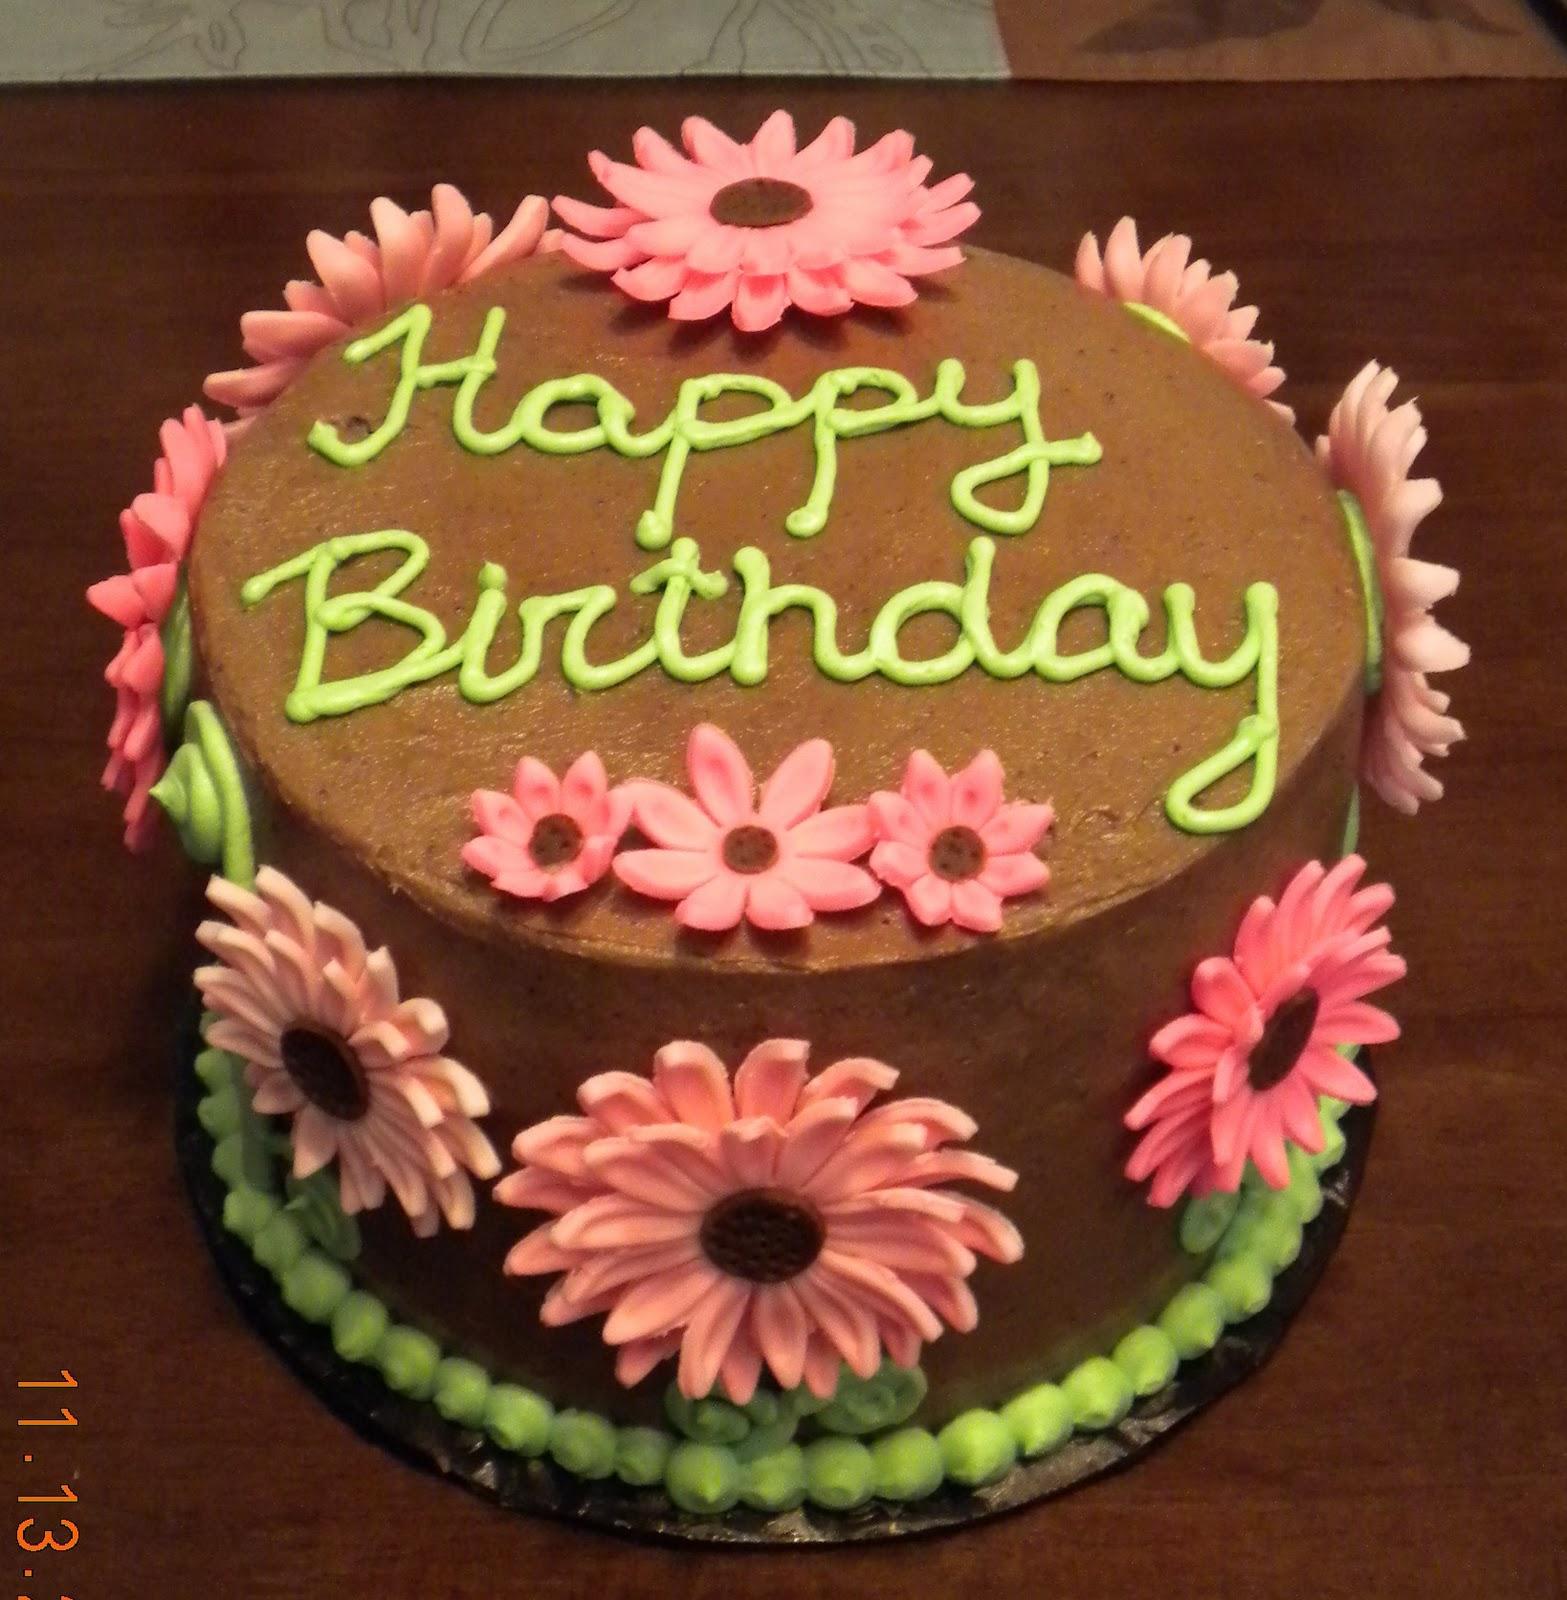 Dragonfly Desserts Happy 12th Birthday Genesis